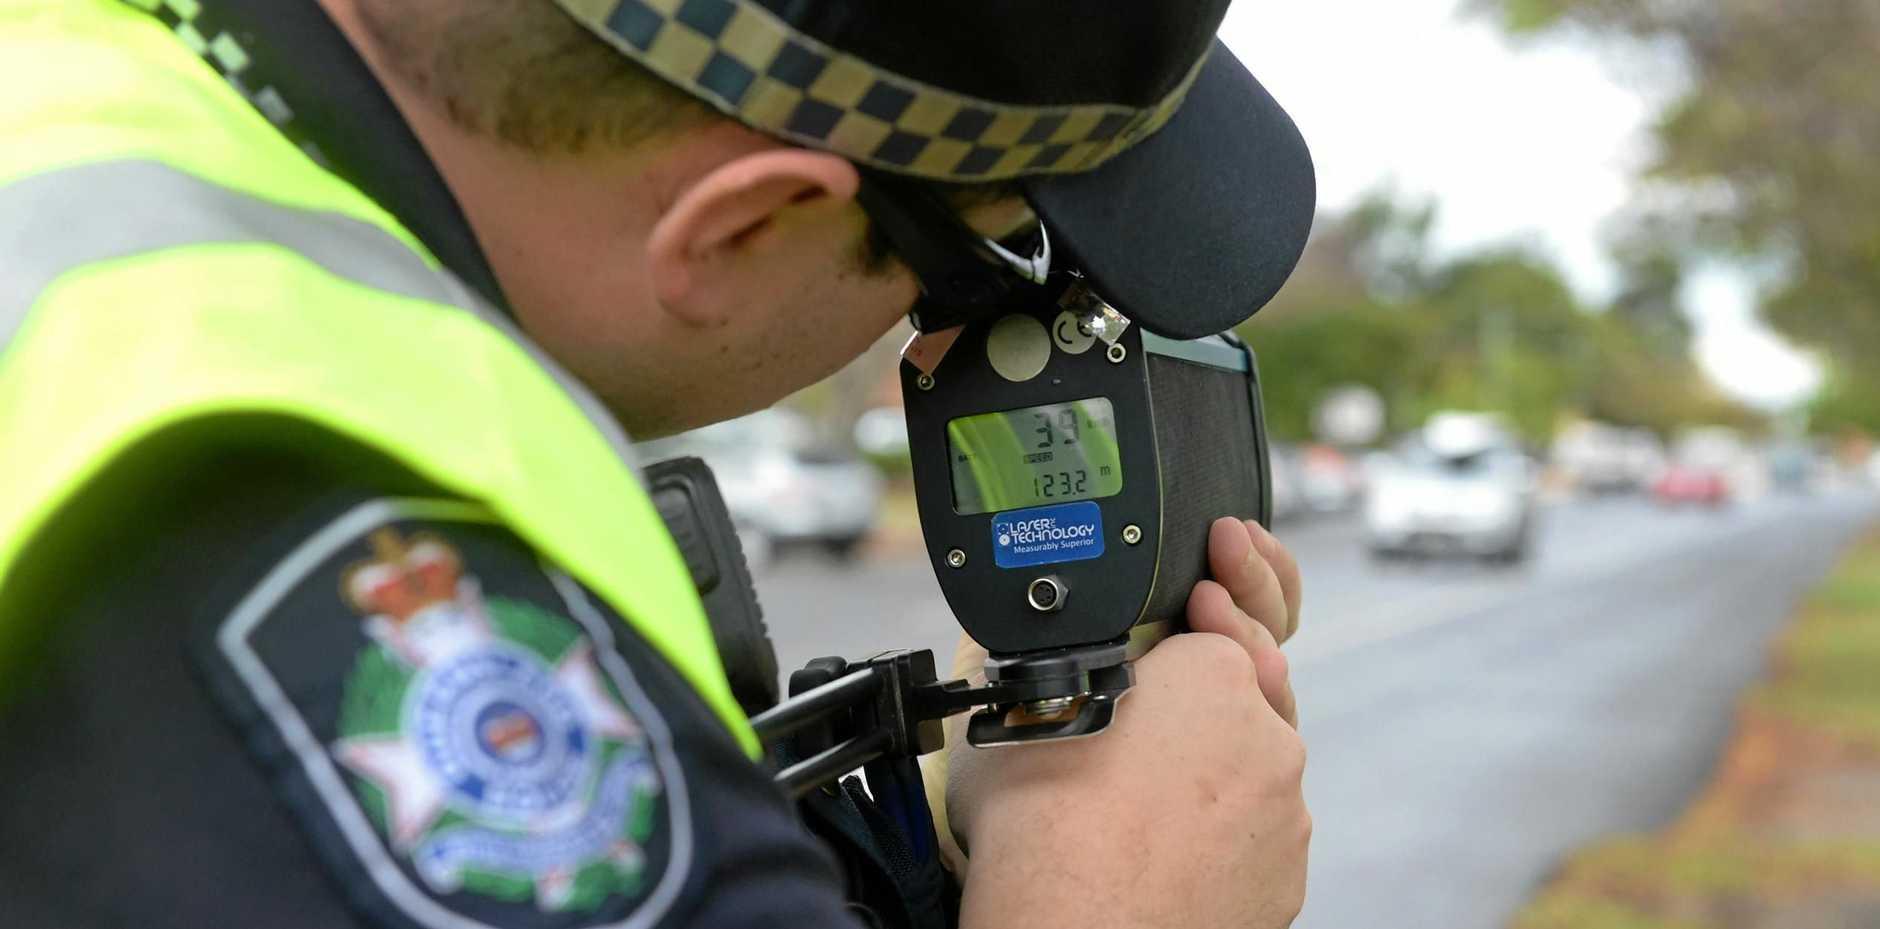 Constable Matthew Bedding participating in speed management LiDAR training.